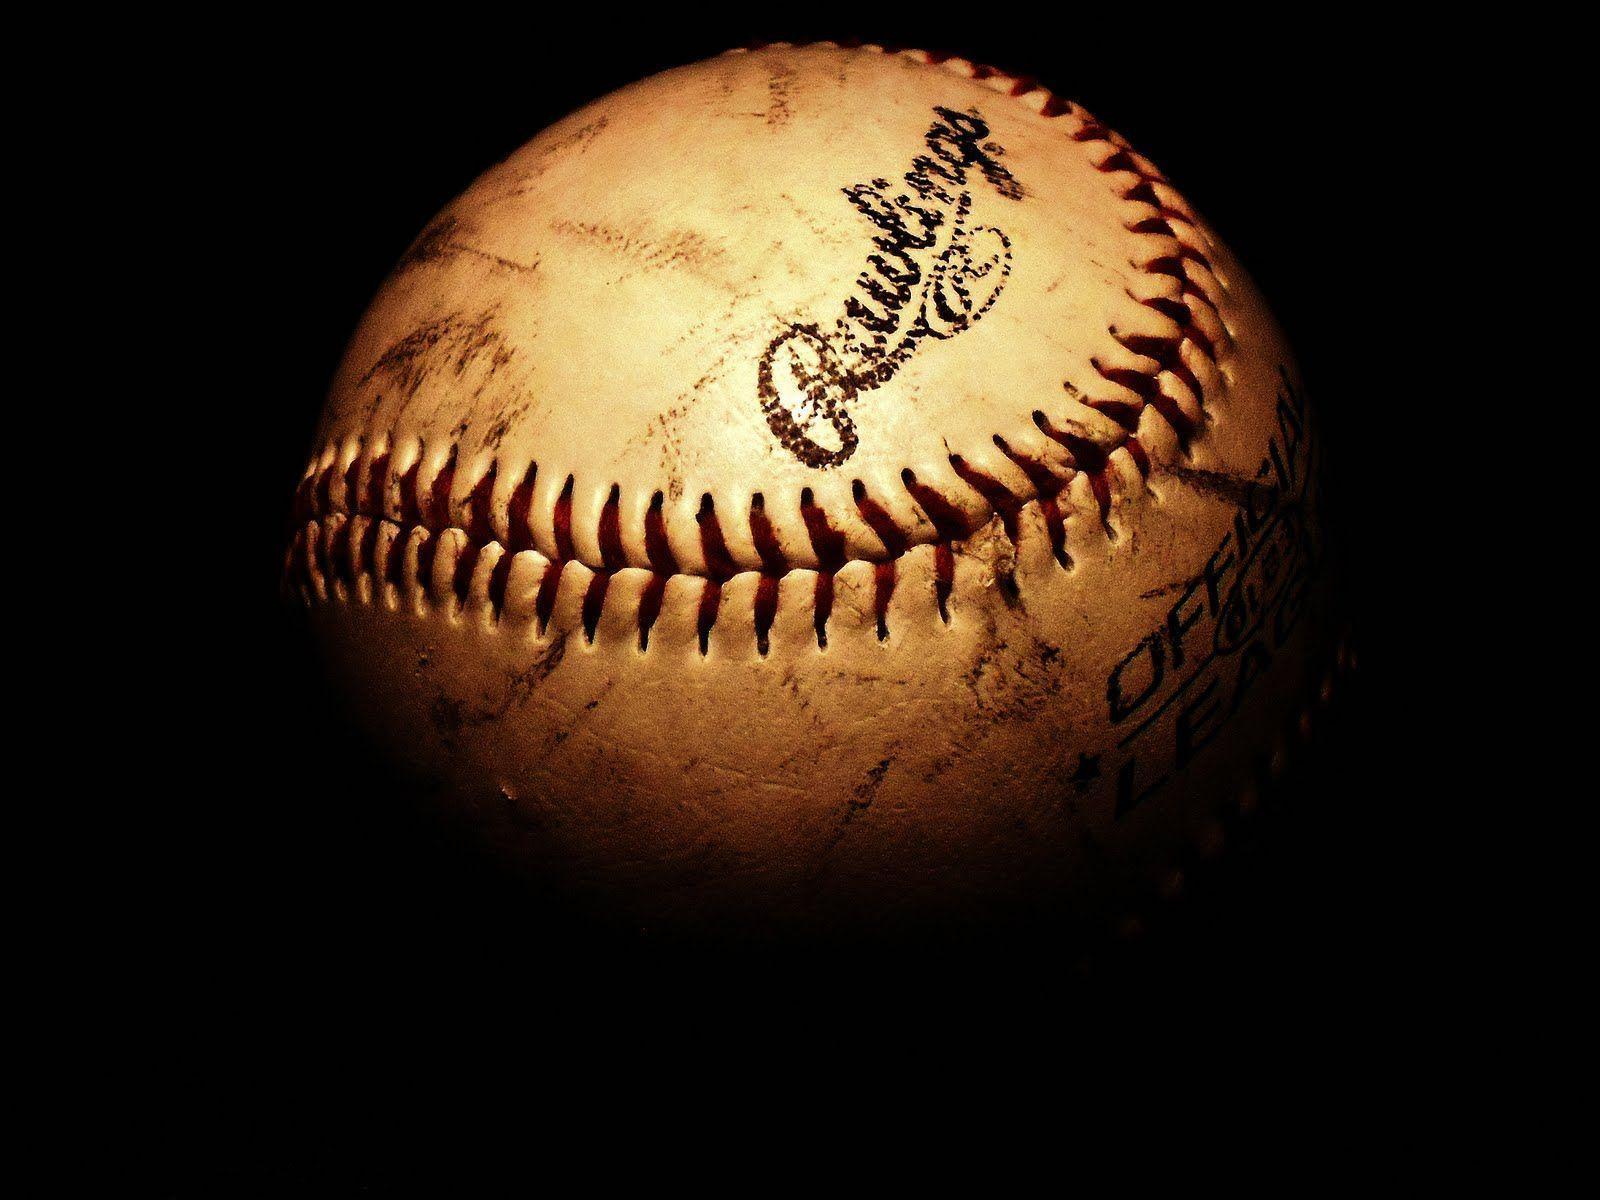 hd desktop wallpaper baseball - photo #39